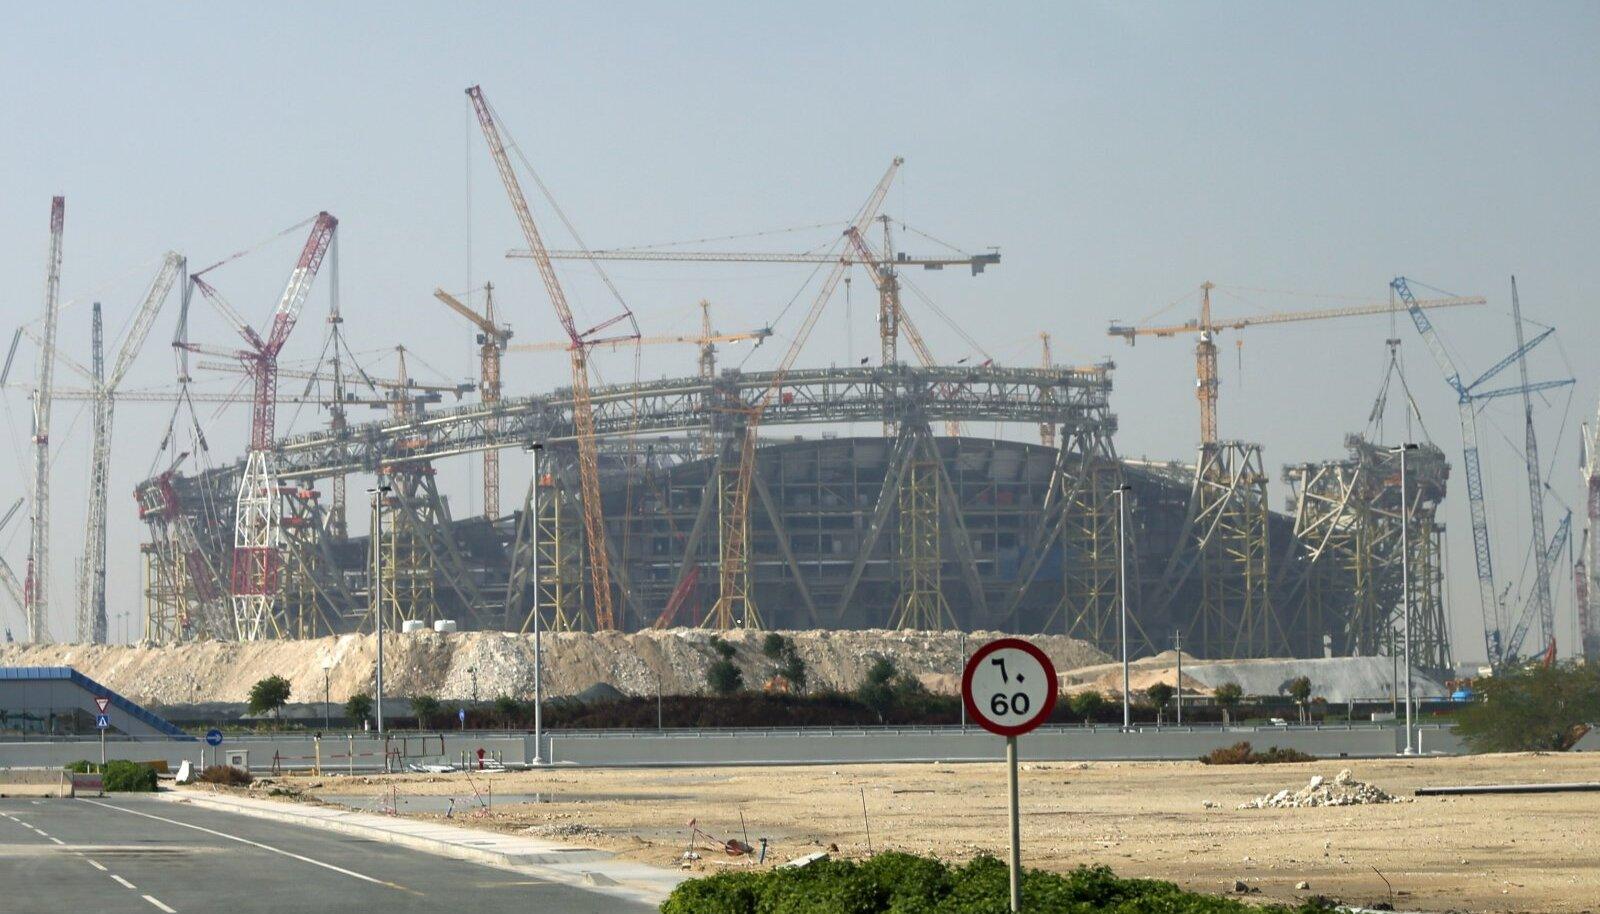 FIFA World Cup 2022 Stadiums in Doha